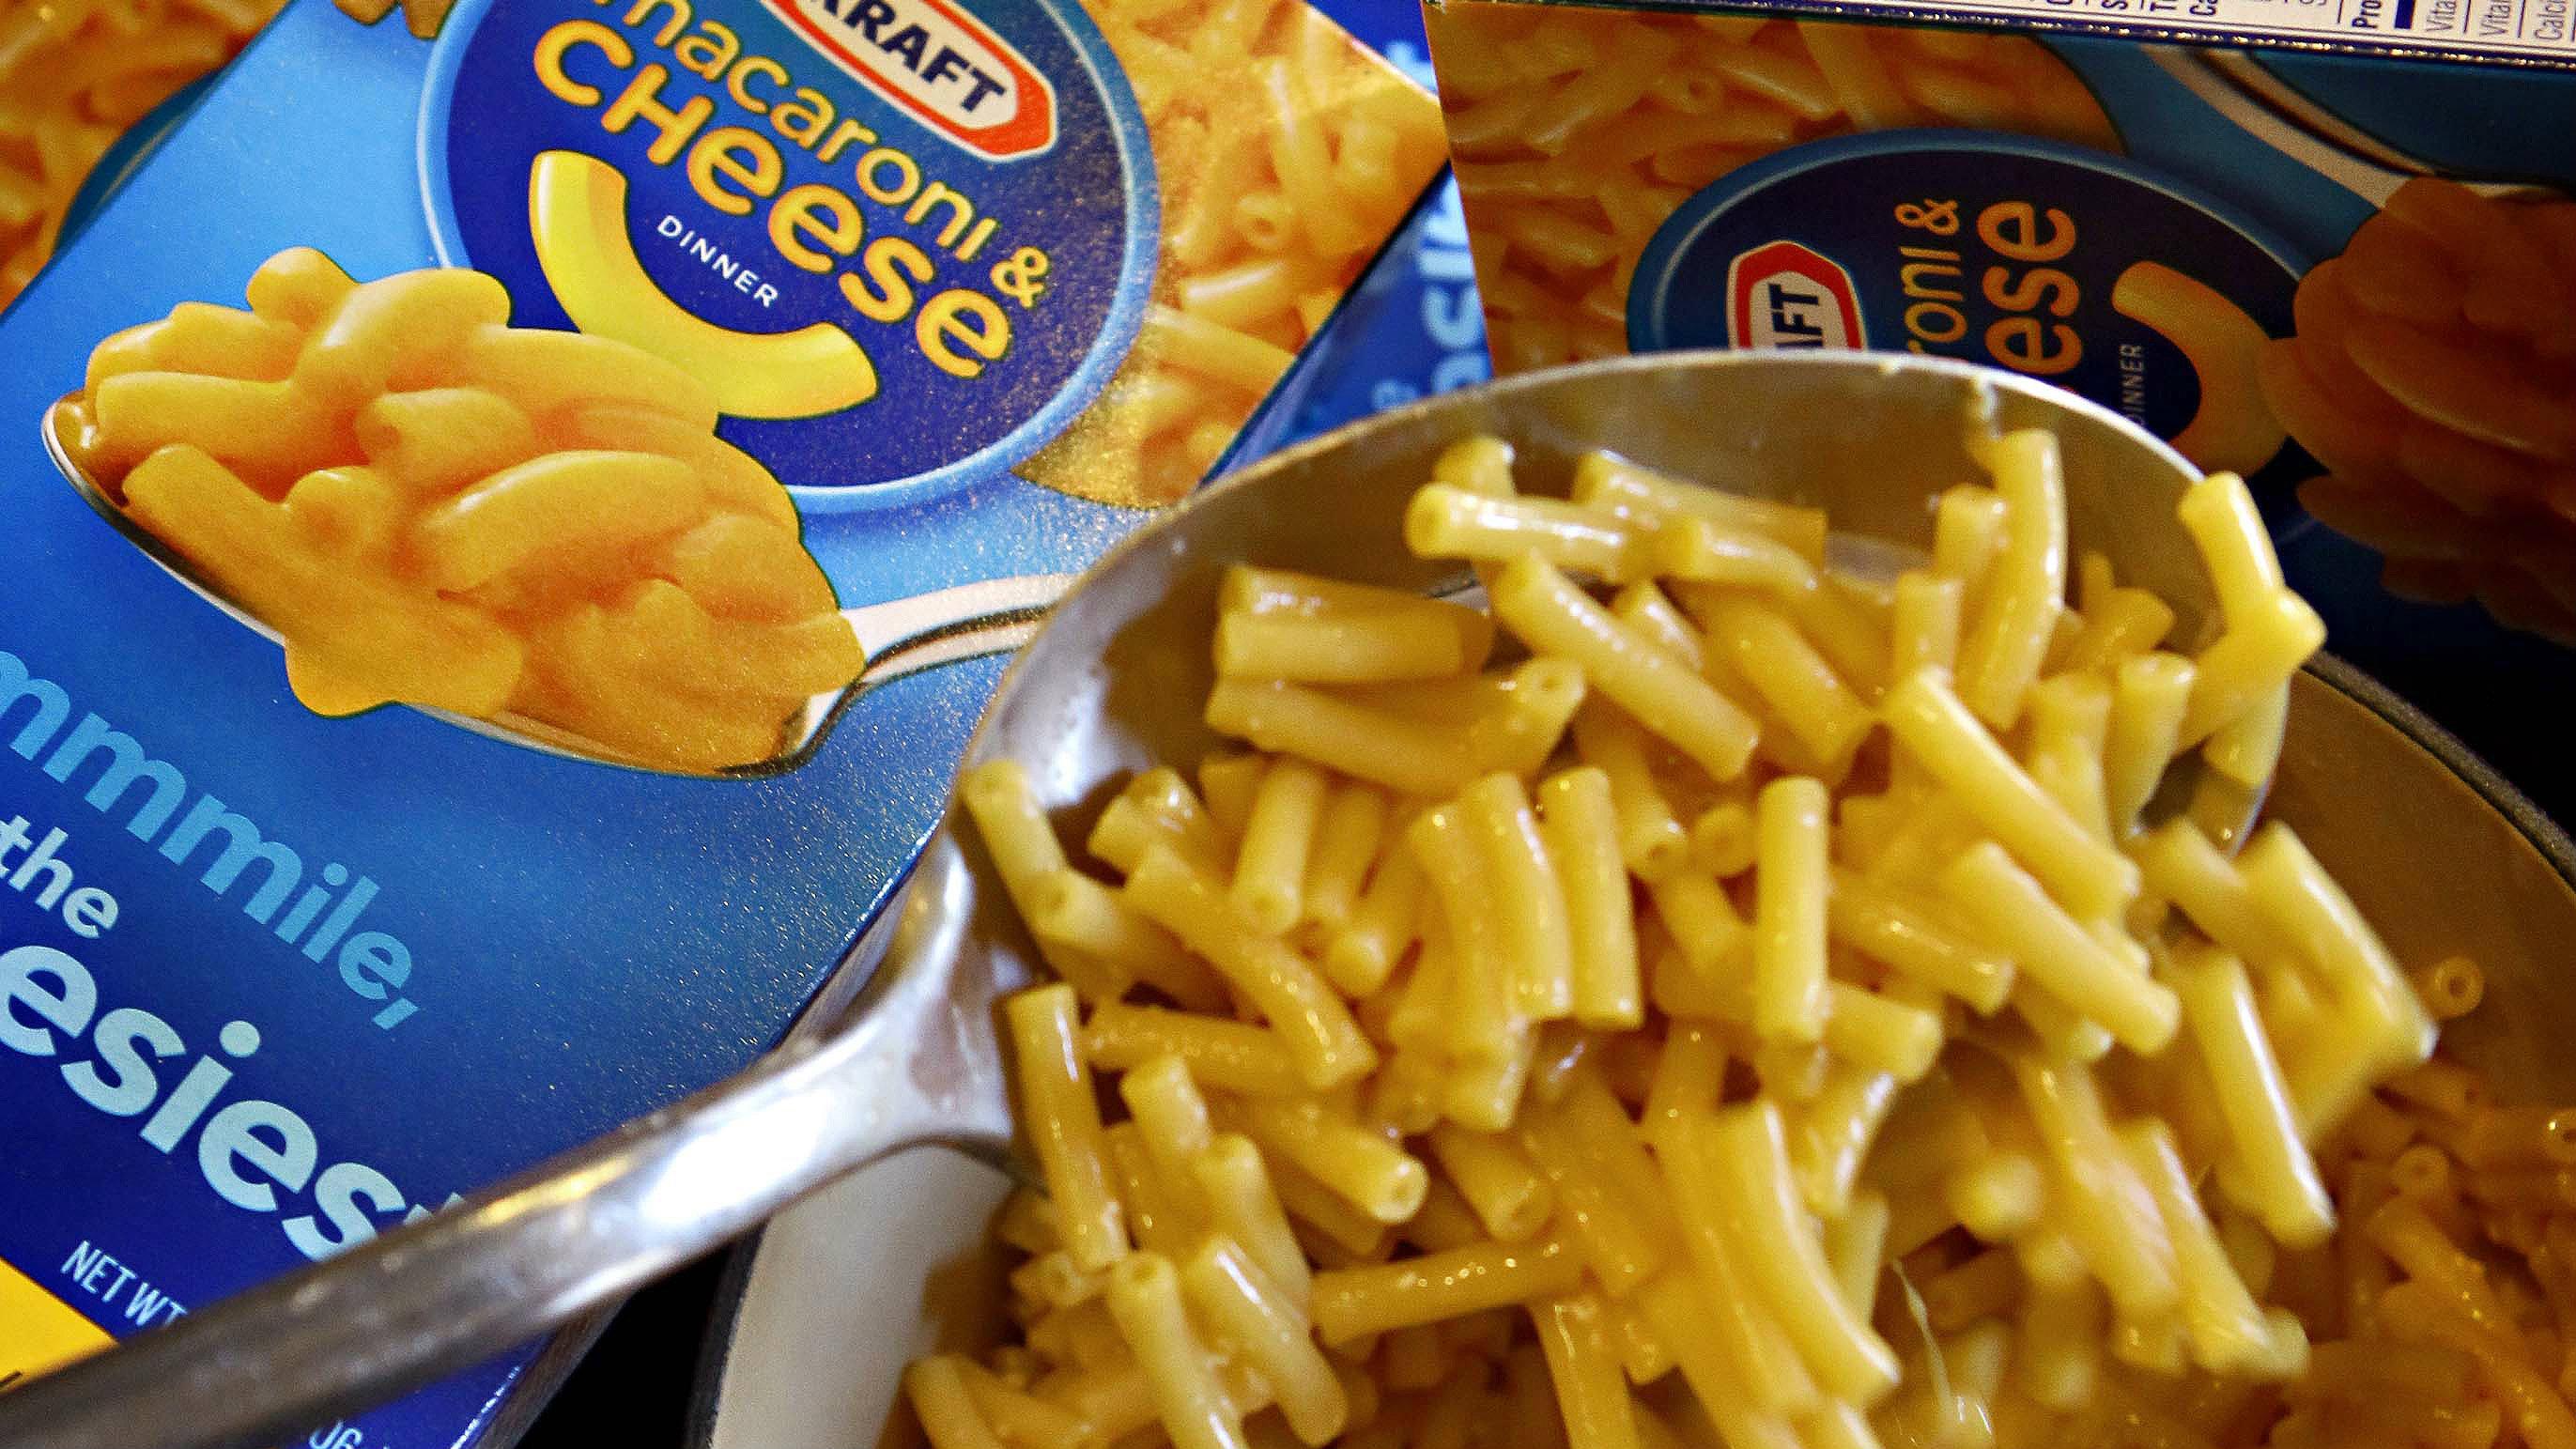 kraft-mac-cheese-artificial-dyes 2